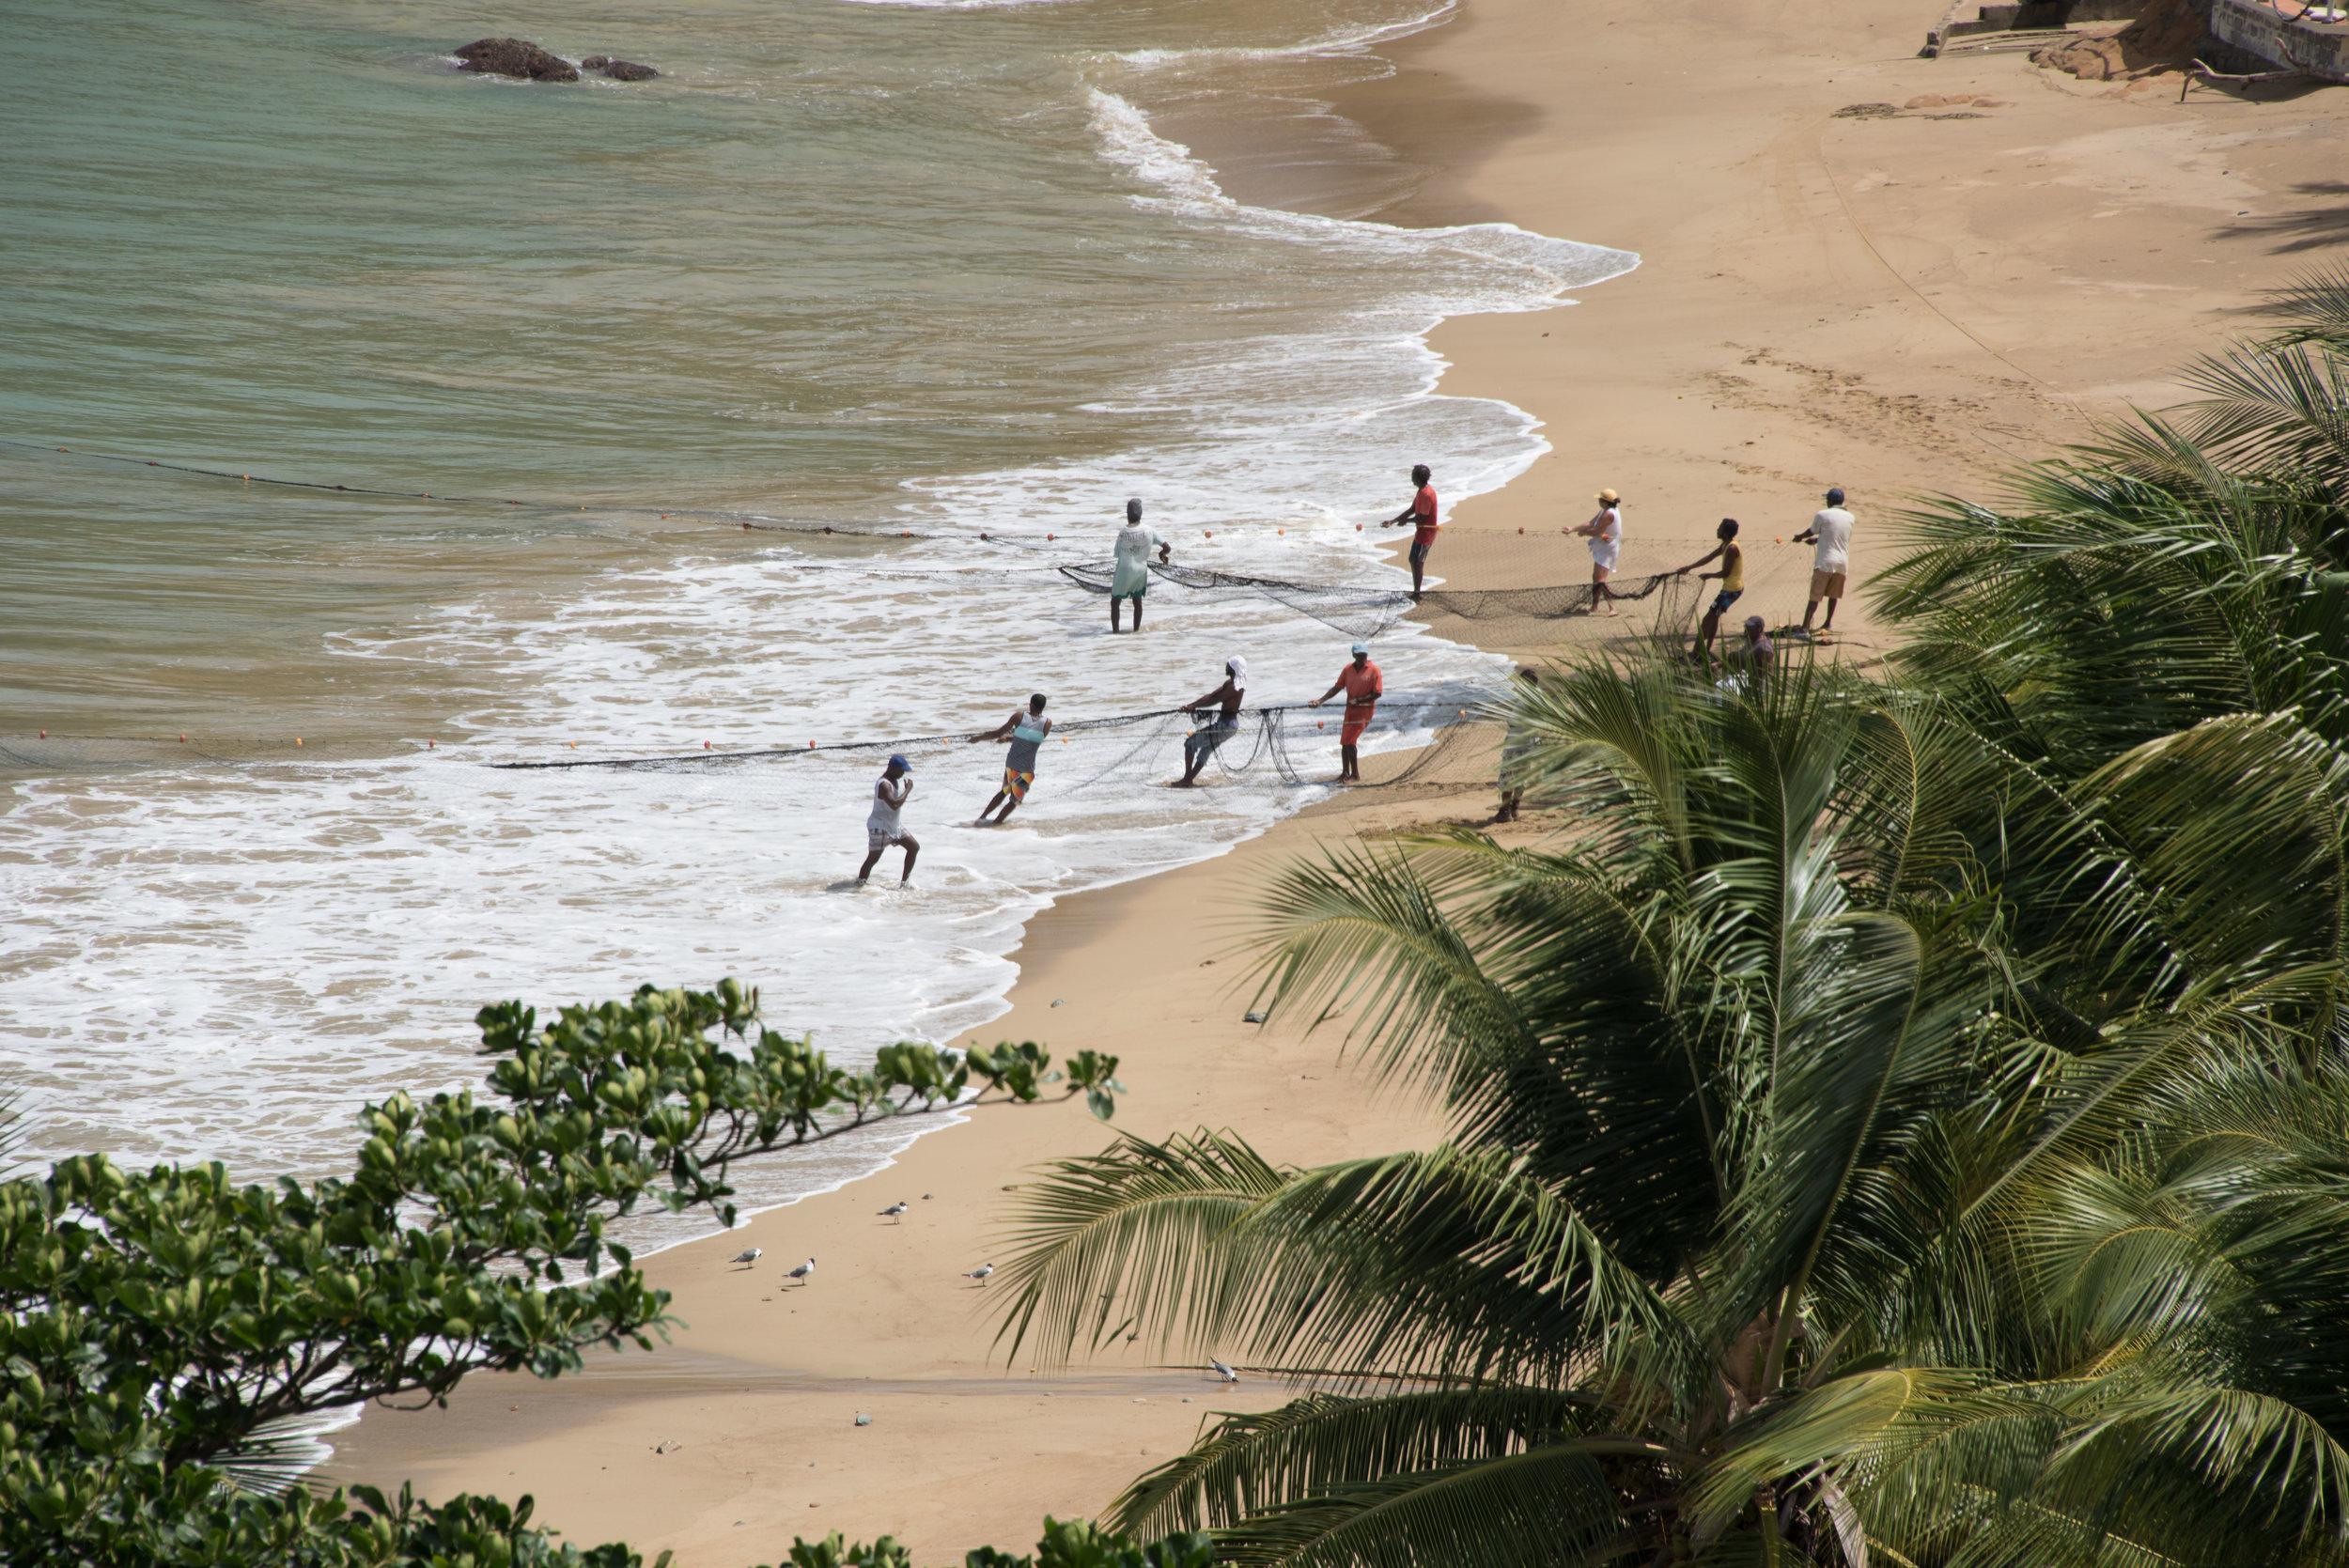 170422_Barrie Fisher_Tobago-1115.jpg